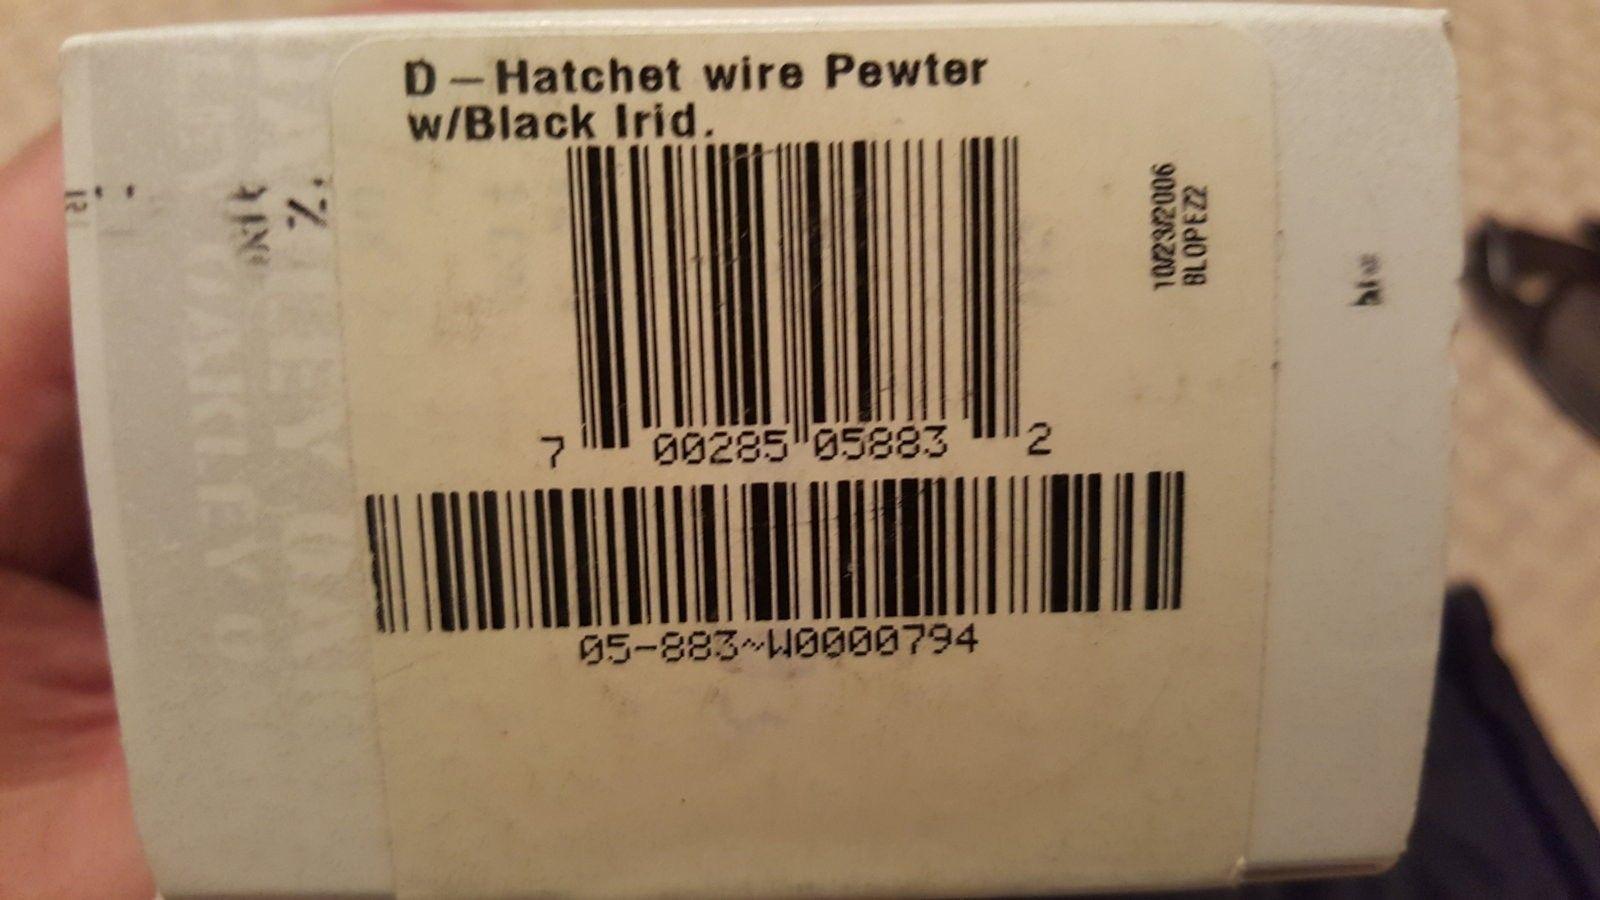 Hatchet Wire BI - 20160404_012131.jpg